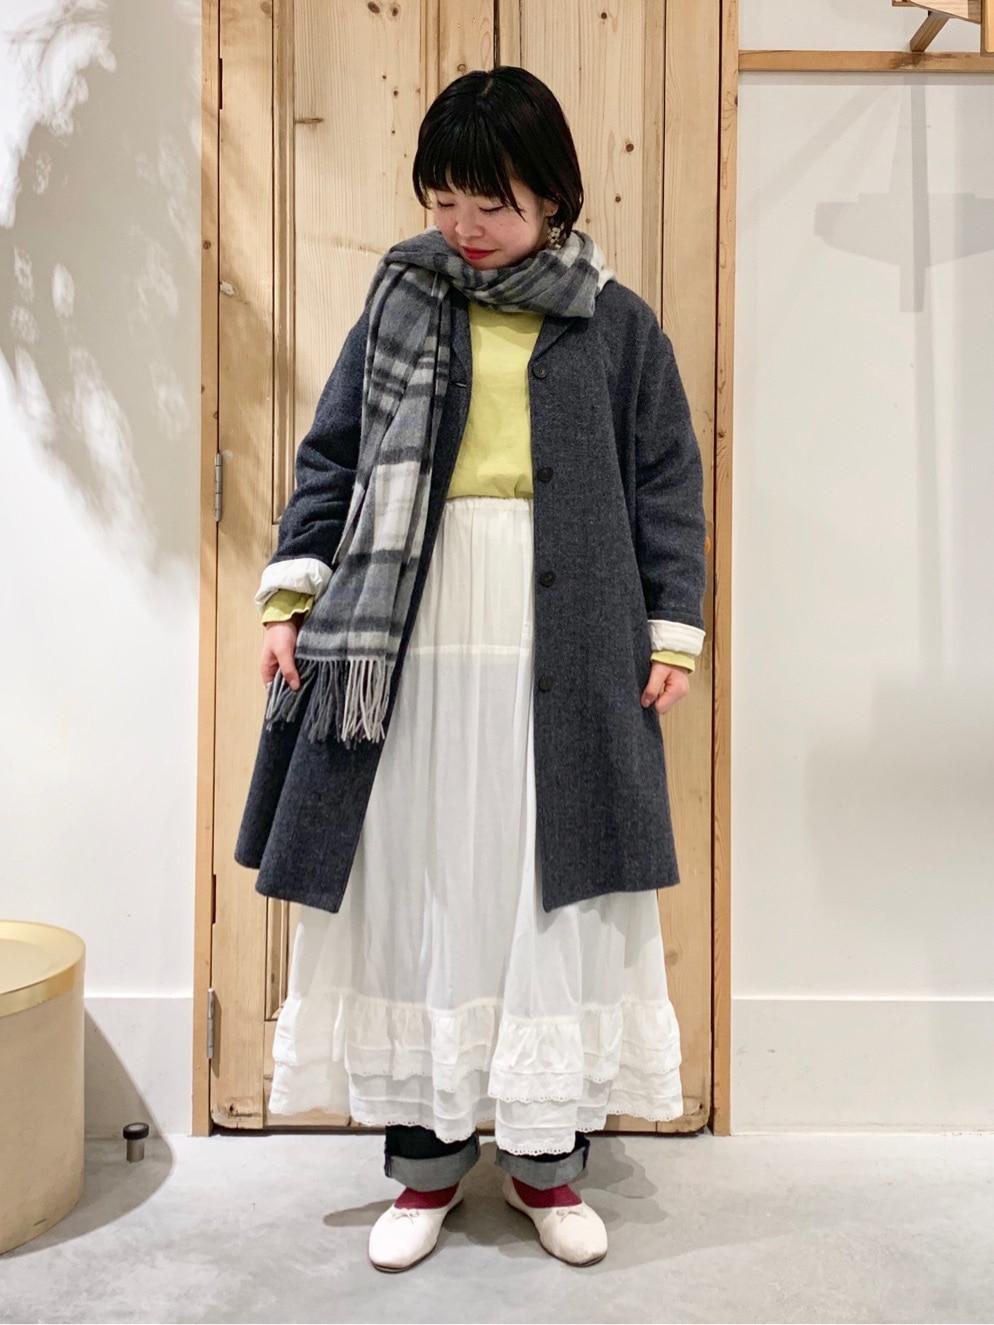 Malle chambre de charme 調布パルコ 身長:153cm 2020.11.06